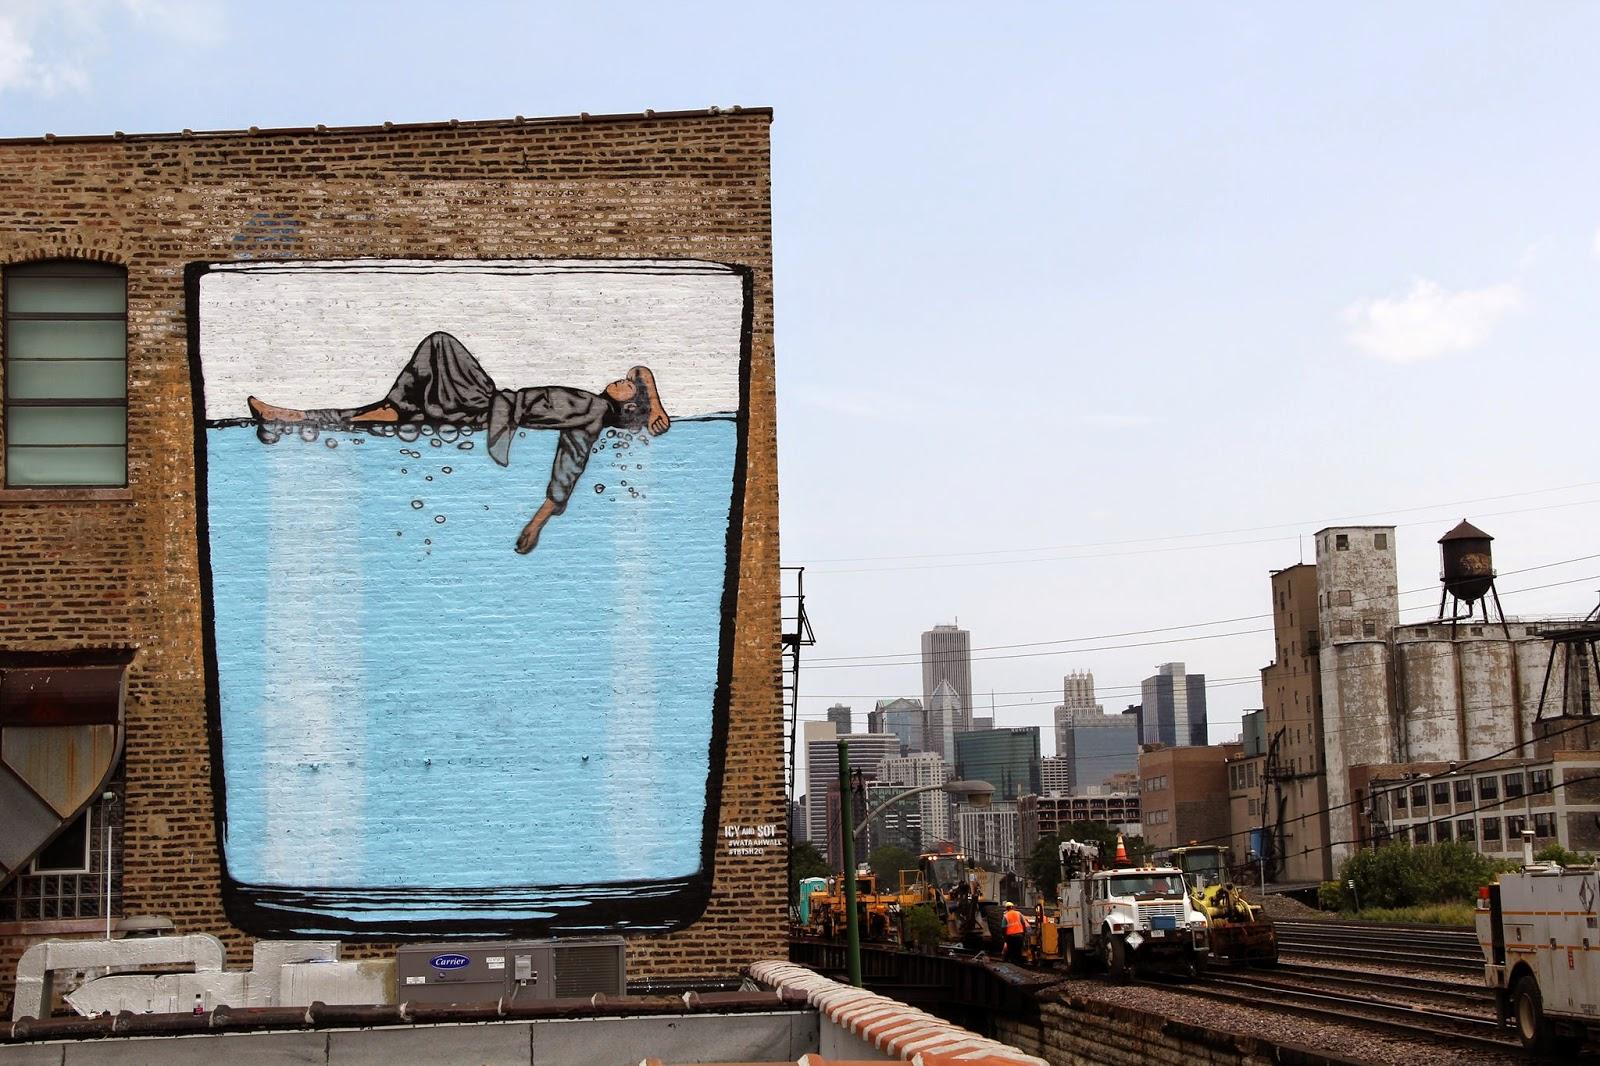 Icy sot new mural chicago usa streetartnews for Chicago mural artist